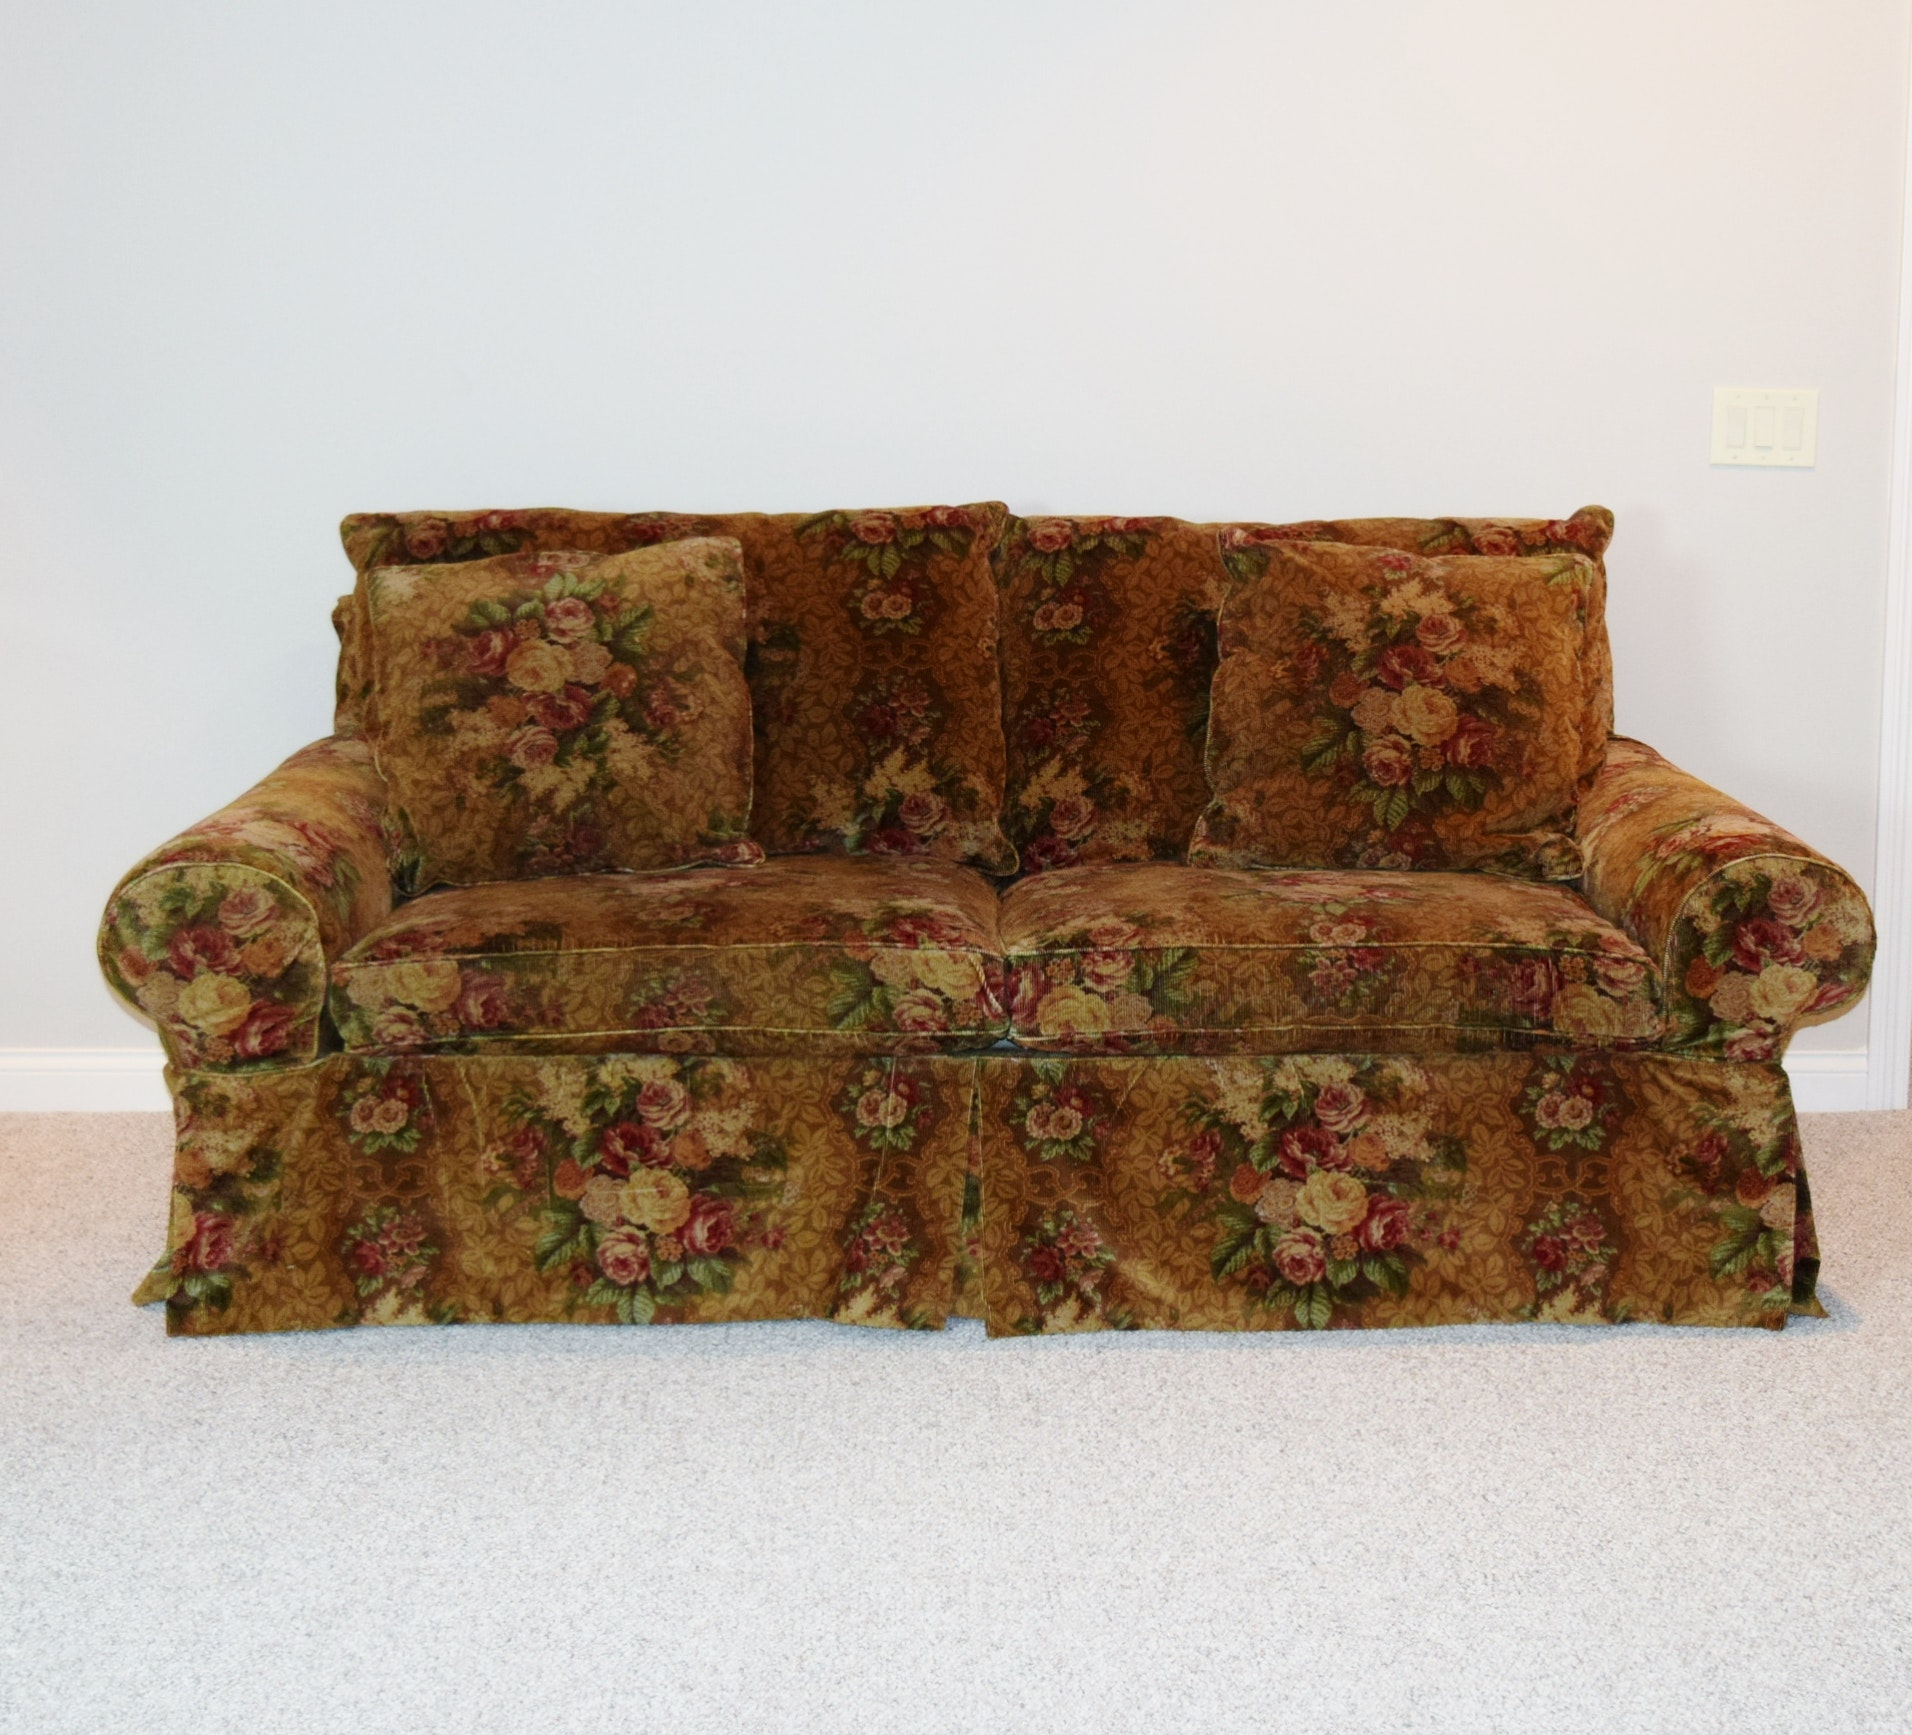 Henredon Corduroy Slipcovered Sofa